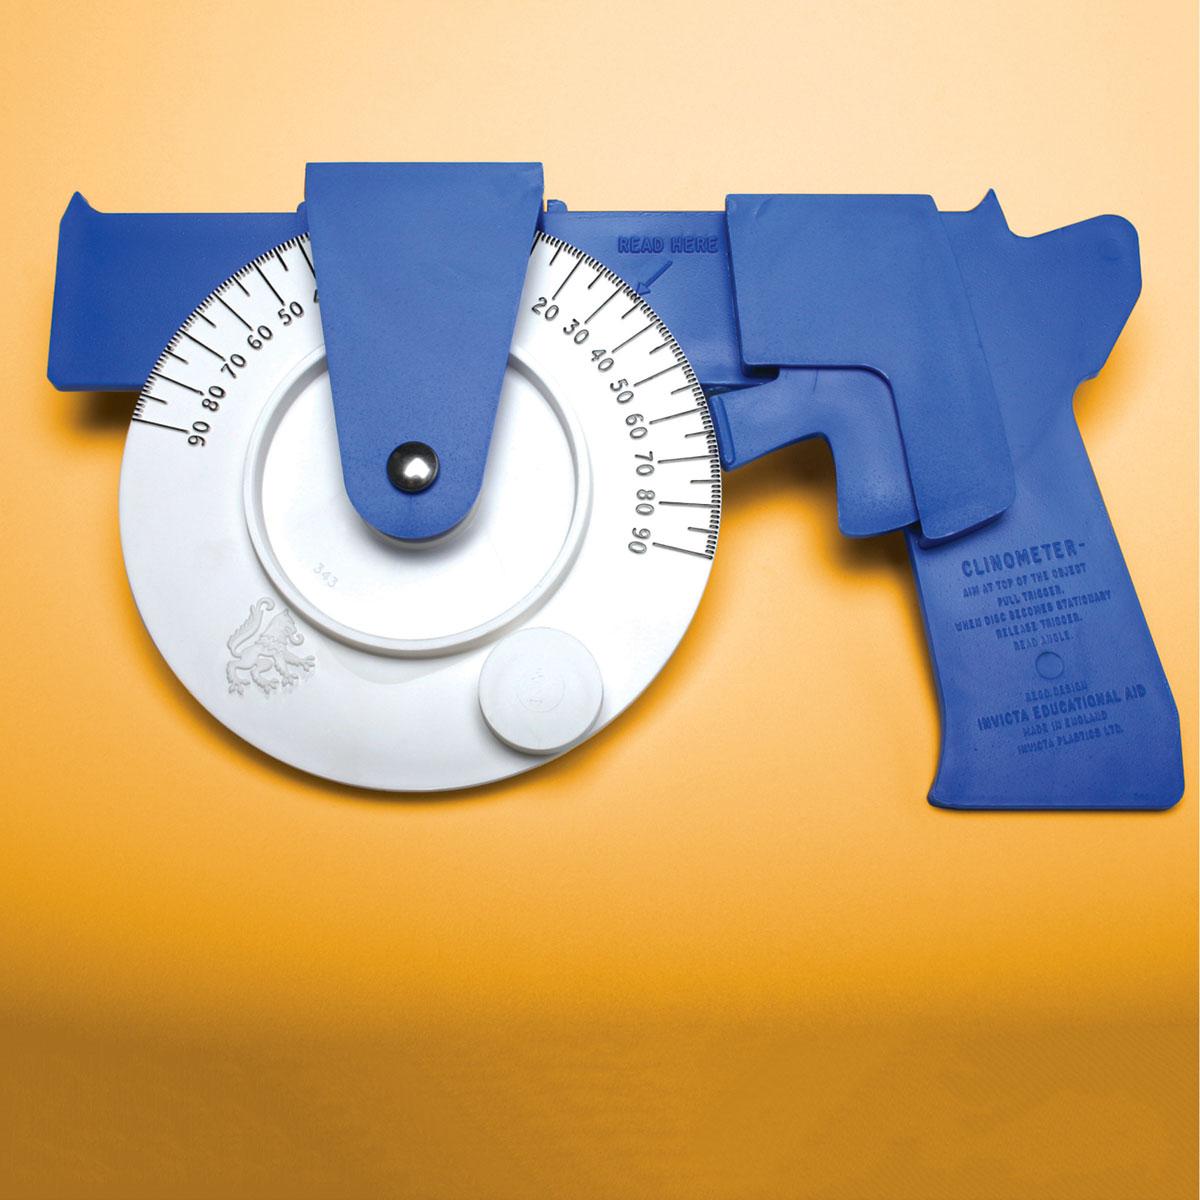 Buy Invicta Mk1 Clinometer Primary Ict Shop For Primary